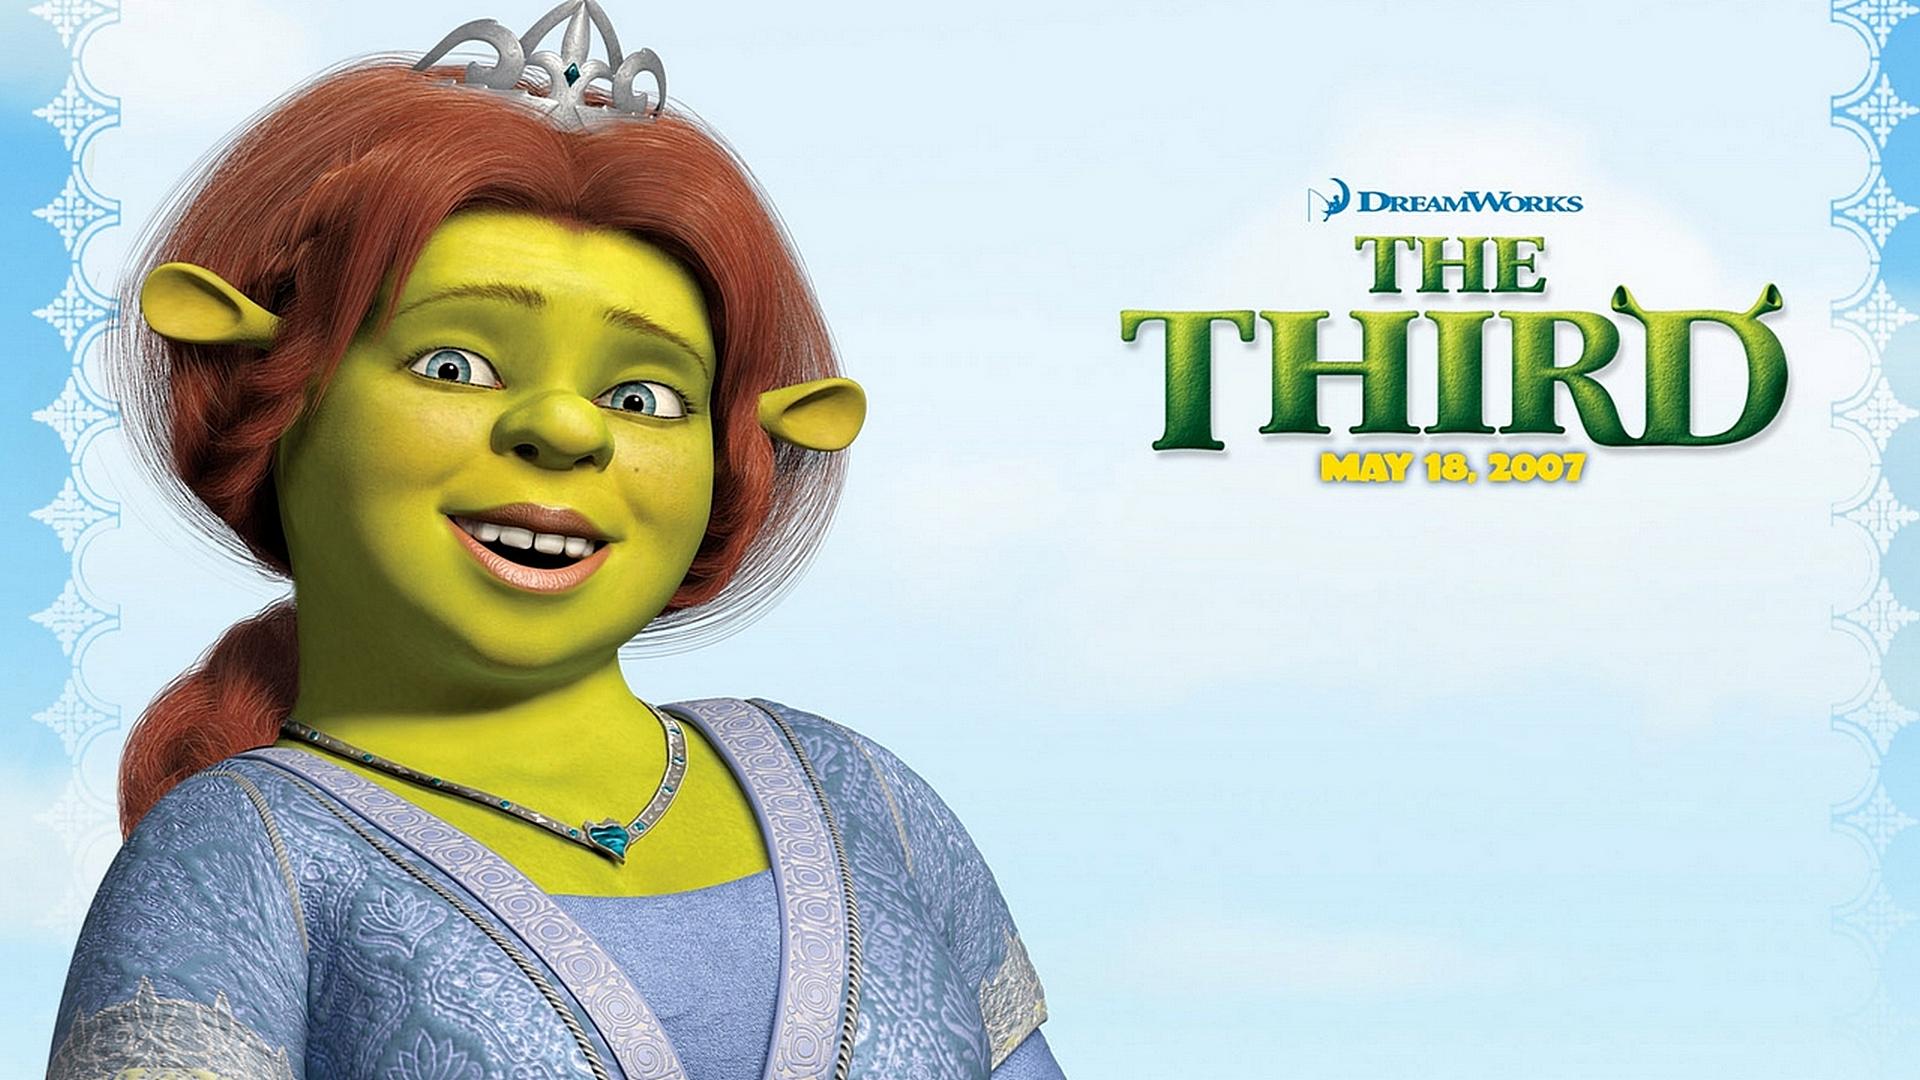 Shrek and fiena having sex nude comic